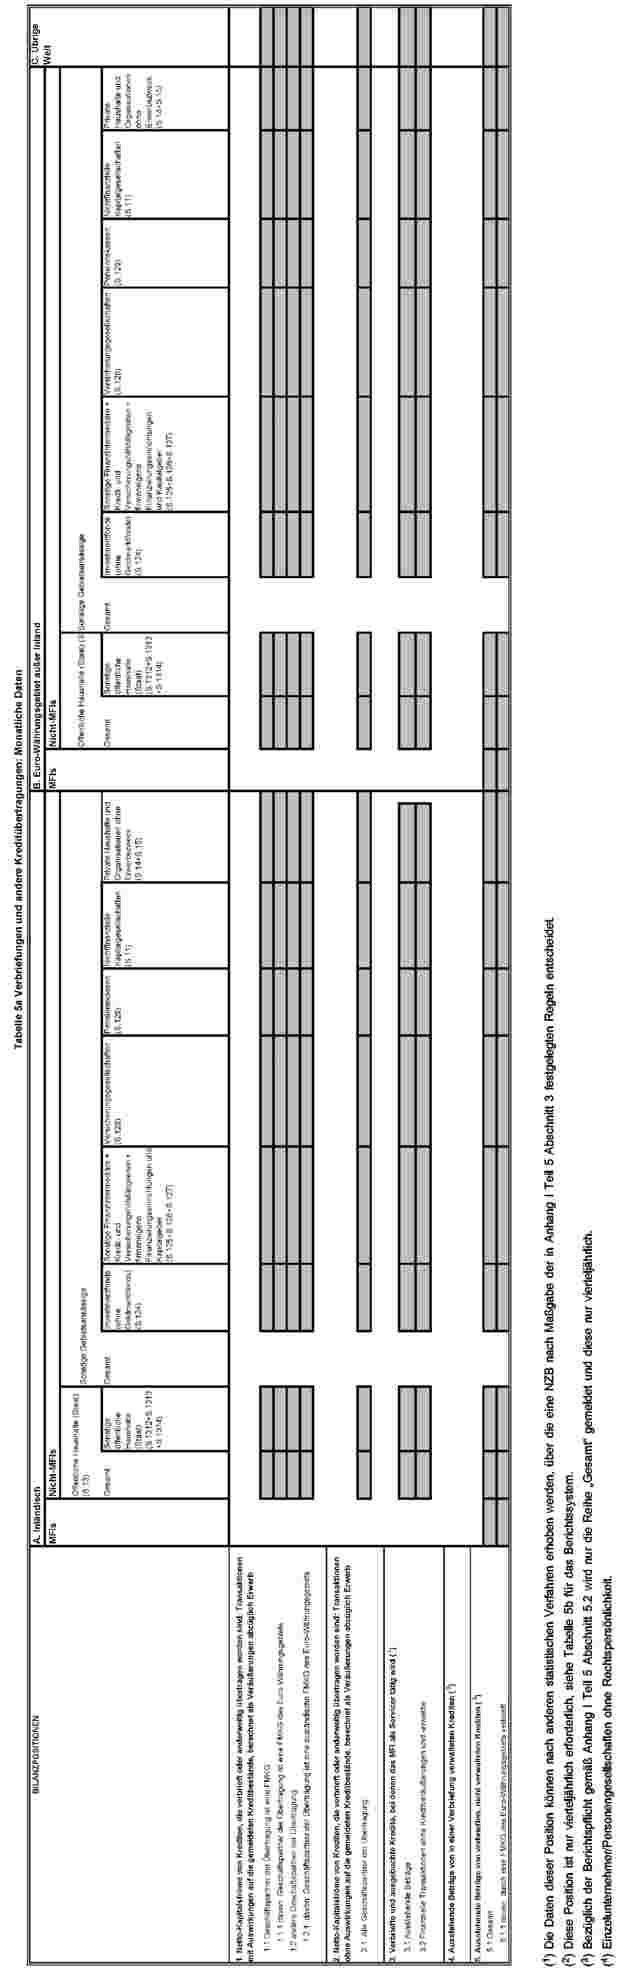 EUR-Lex - 32013R1071 - EN - EUR-Lex